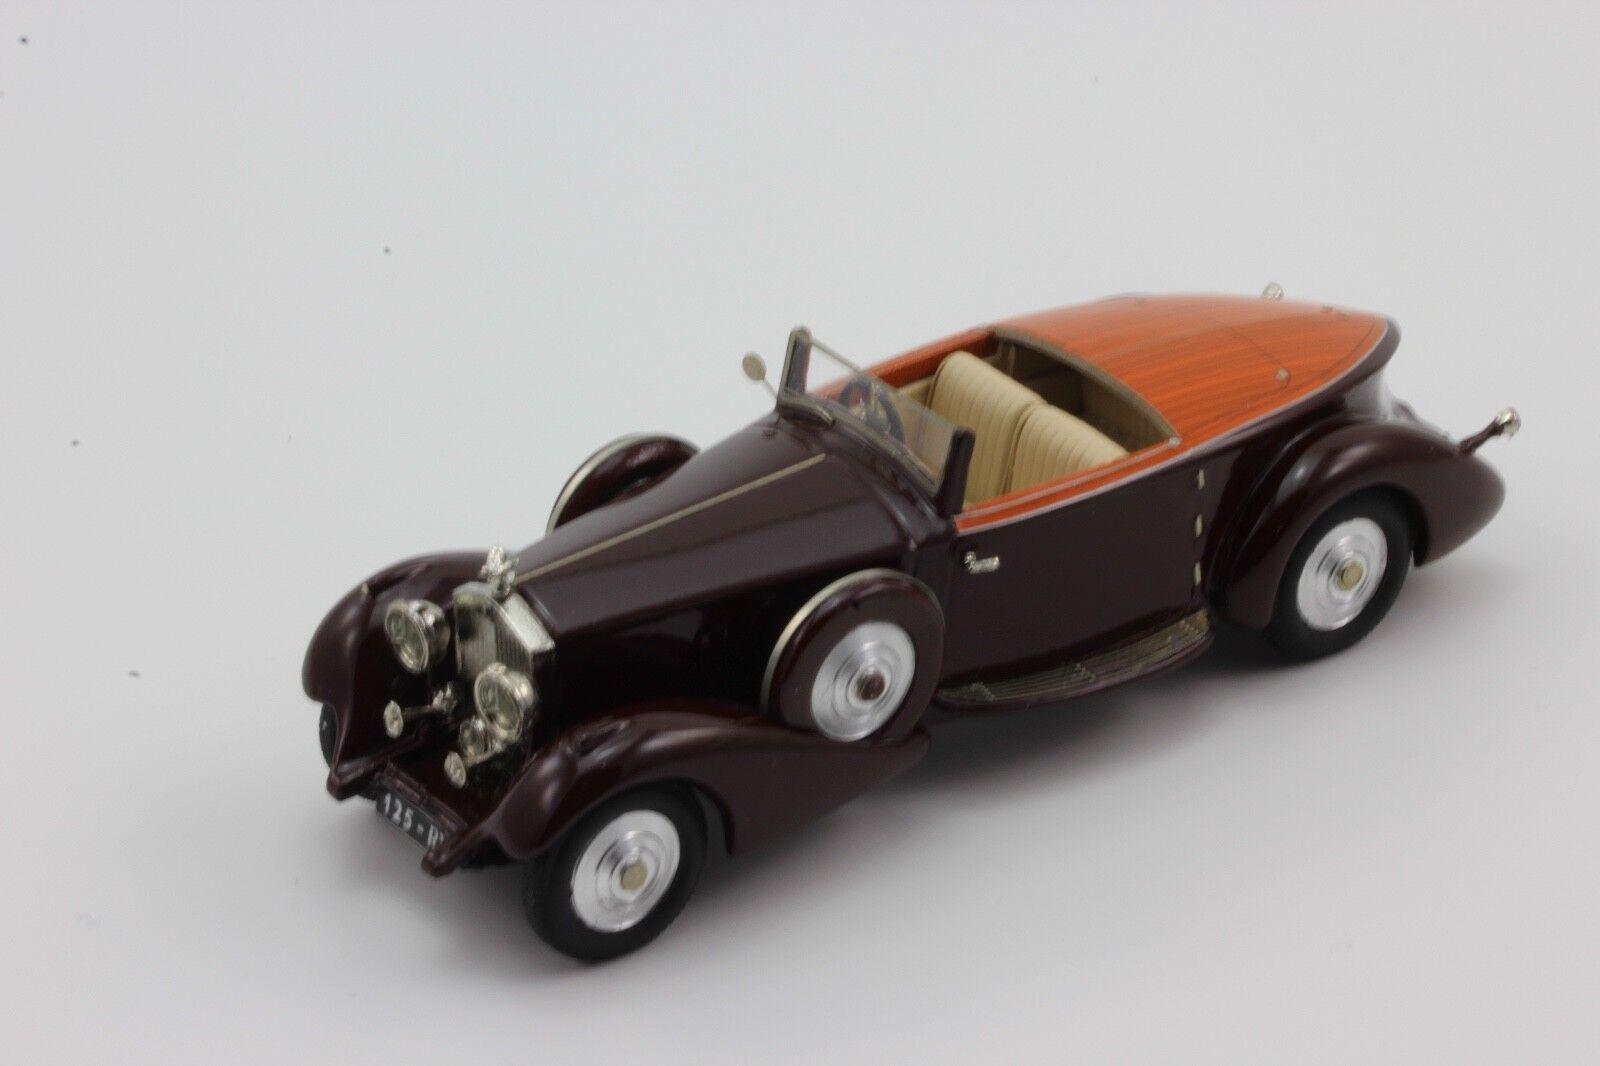 CCC Rolls Royce Phantom II 125 RY BOATTAIL 1 43 by Mulliner 1934 CCC 202